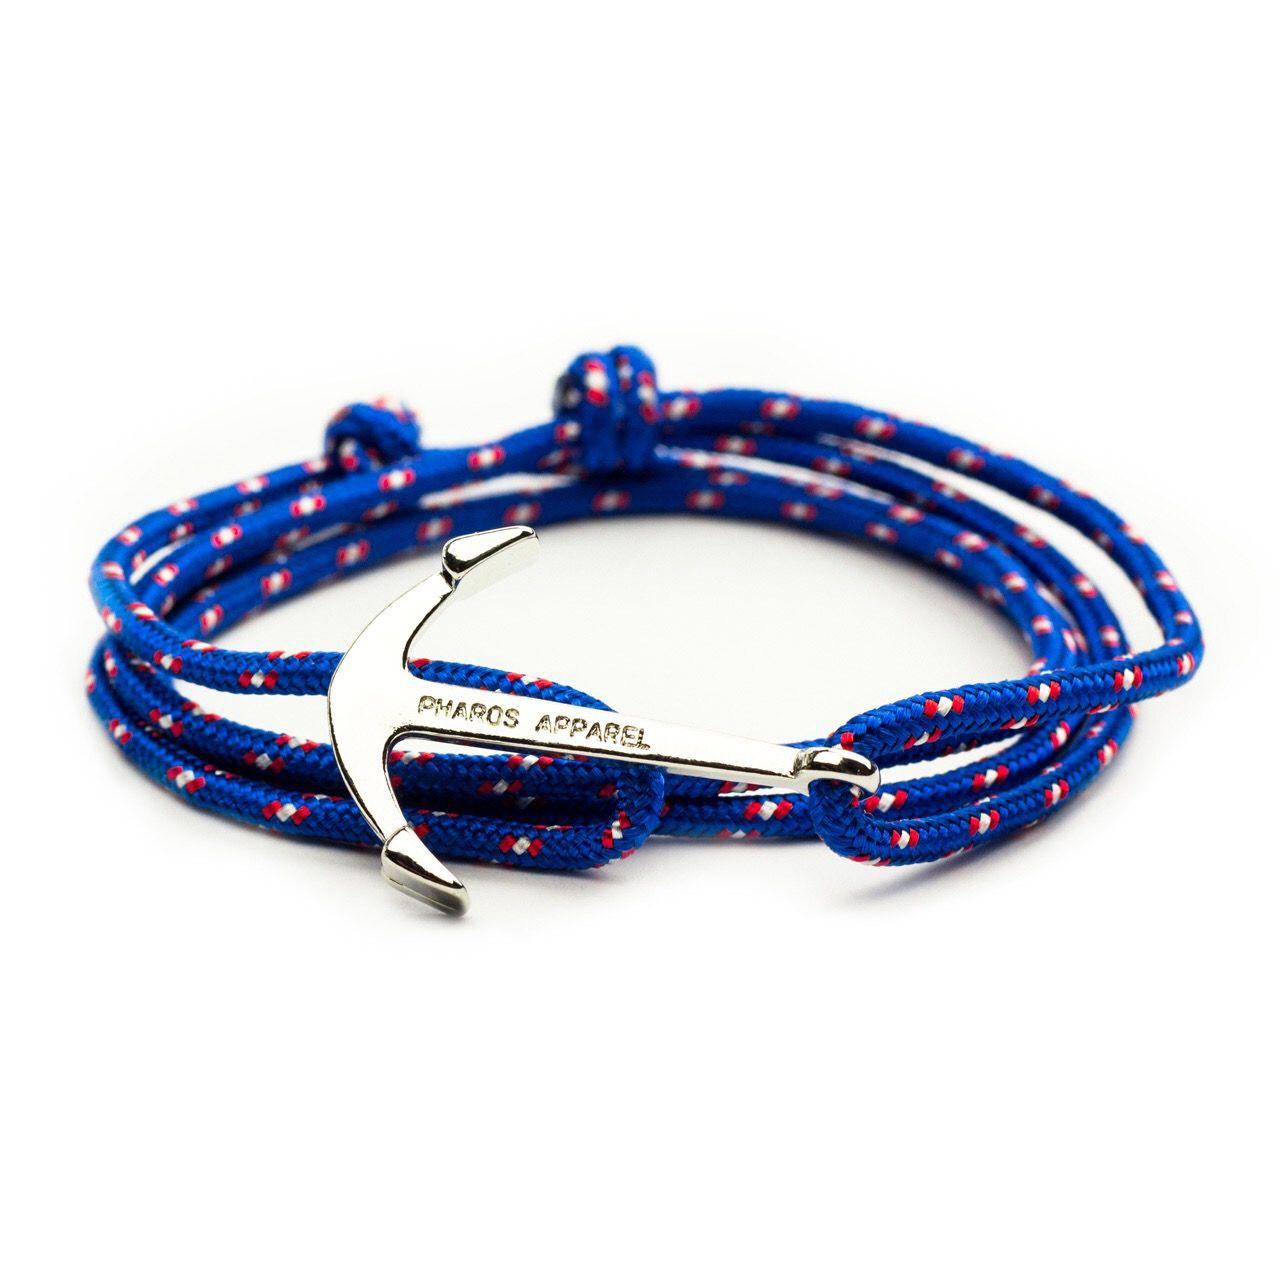 55f98906007fc Royal blue anchor bracelet men women preppy pharos apparel accessories jpg  1280x1280 Royal blue accessories for